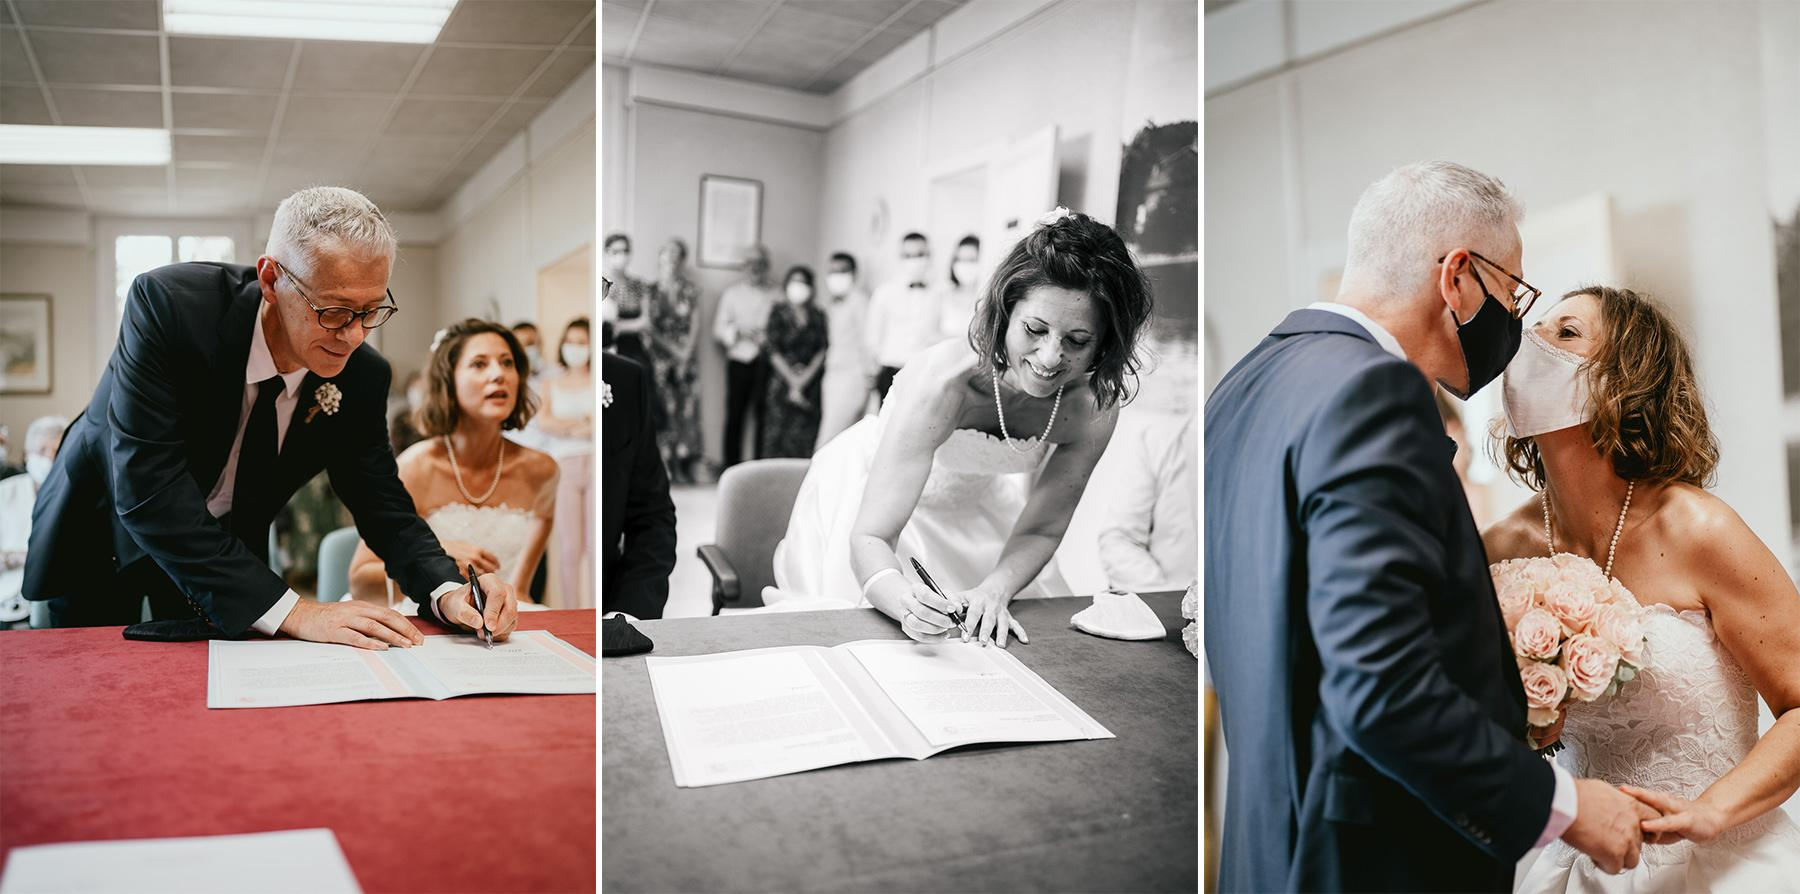 Photographe mariage landes dax aquitaine 1